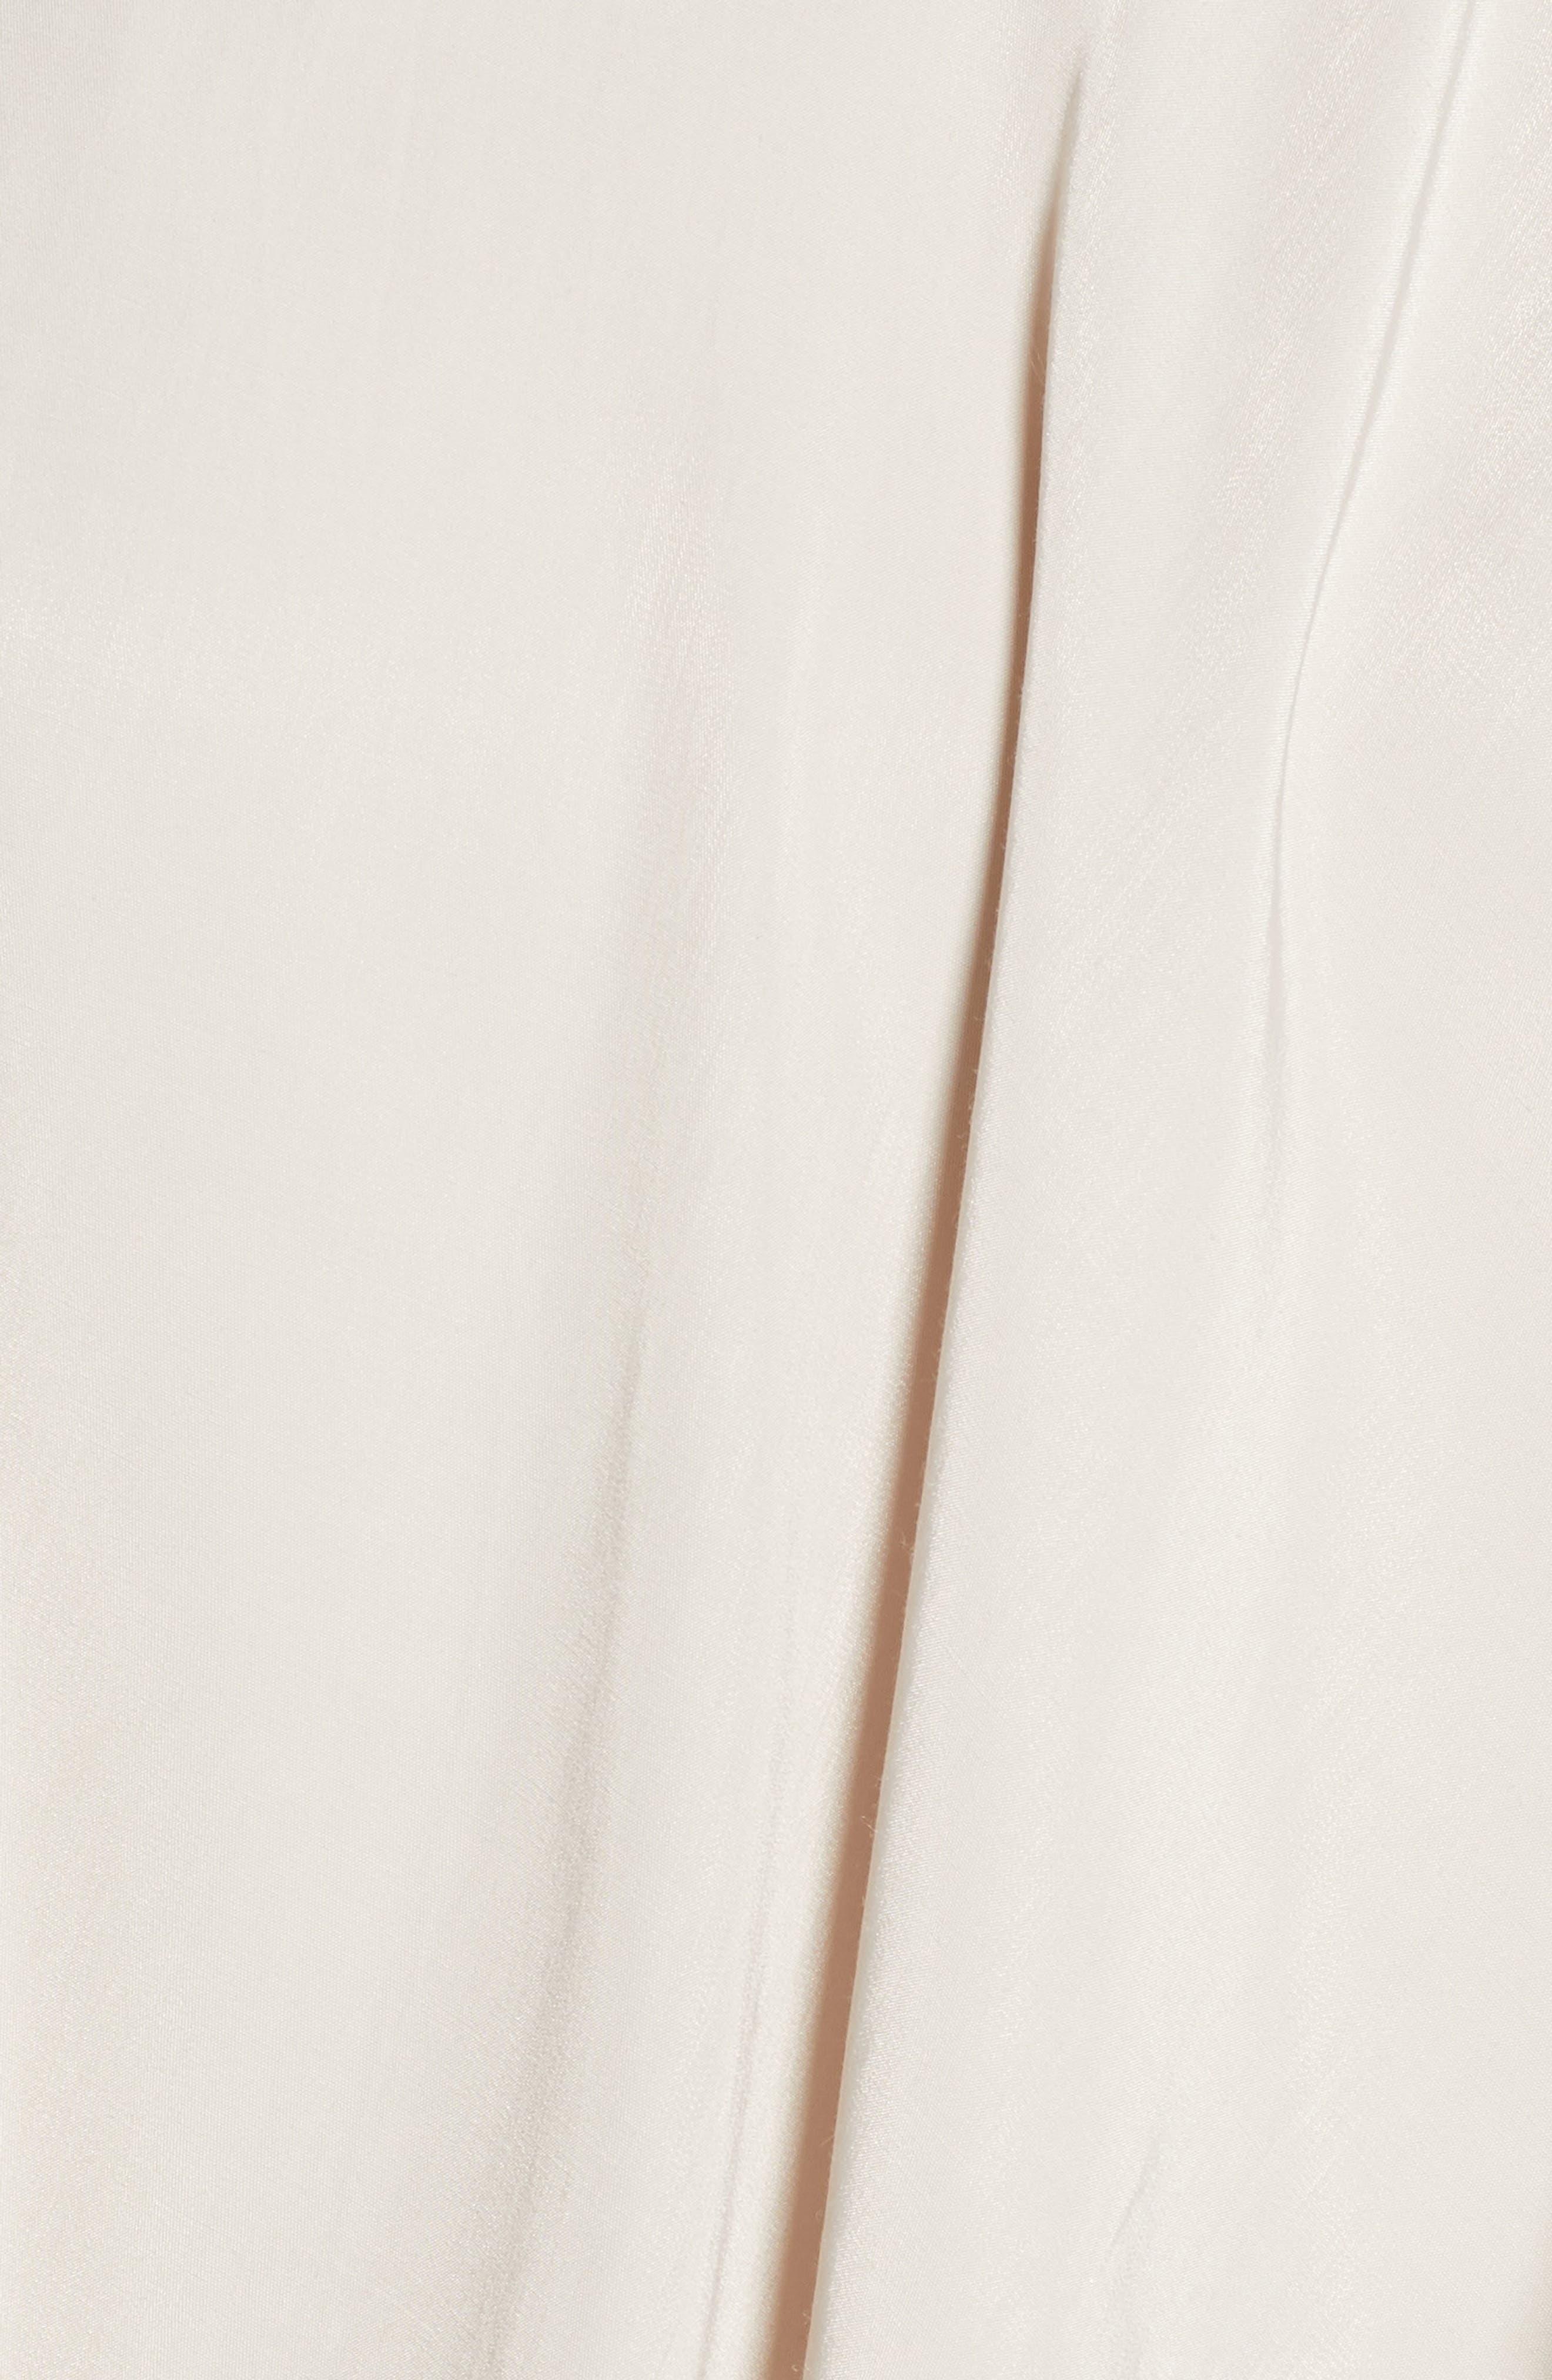 Hangin Ruff One-Shoulder Top,                             Alternate thumbnail 6, color,                             054